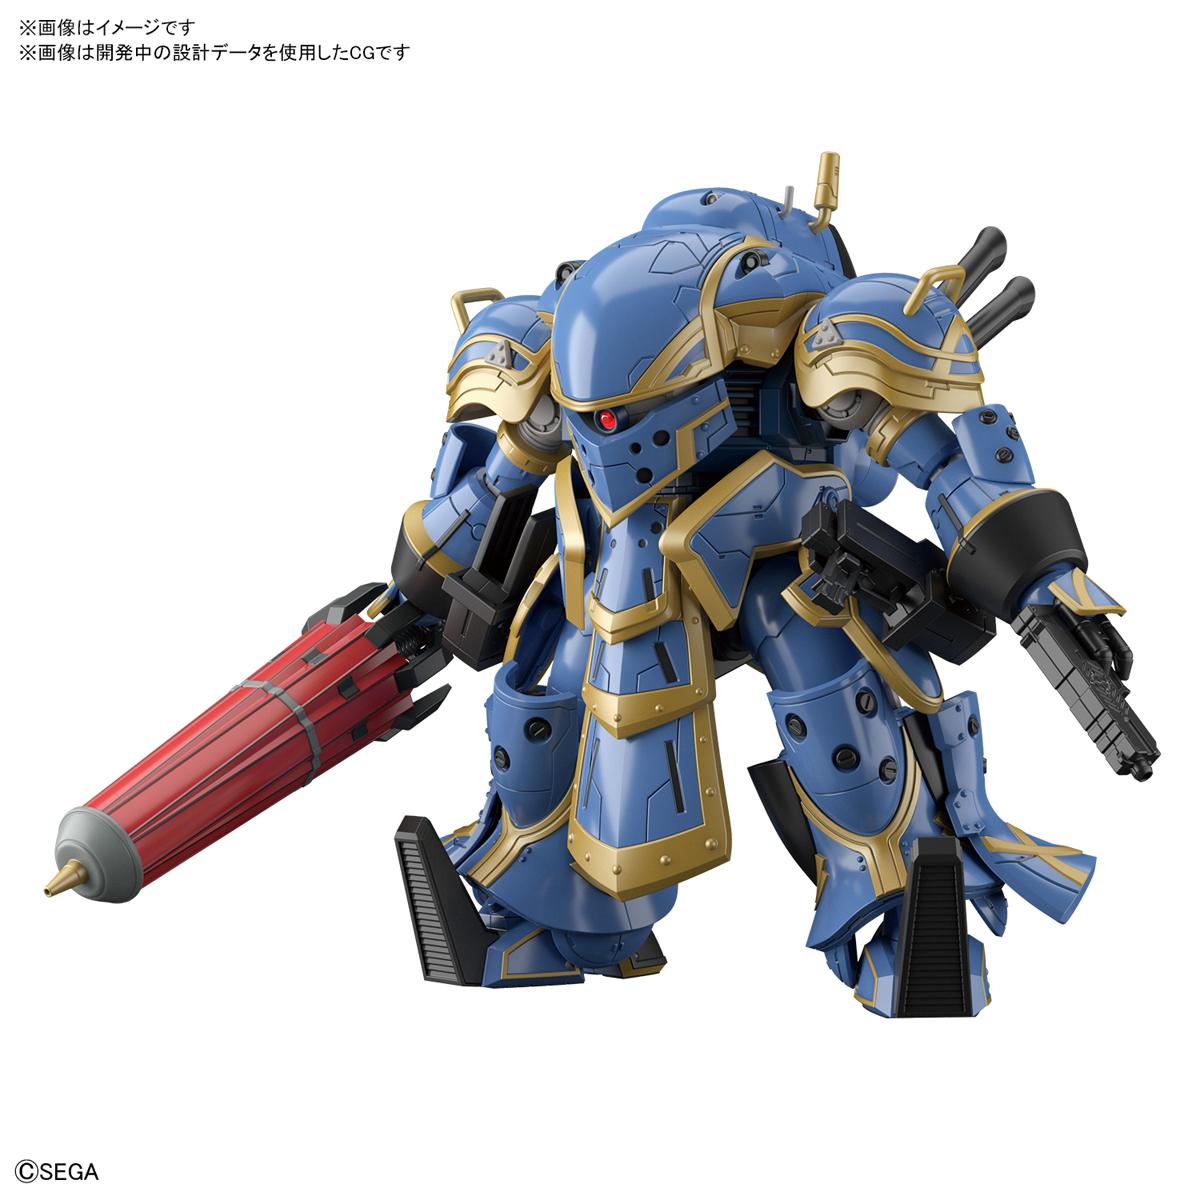 HG 1/24『霊子戦闘機・無限(アナスタシア・パルマ機)』新サクラ大戦 プラモデル-002